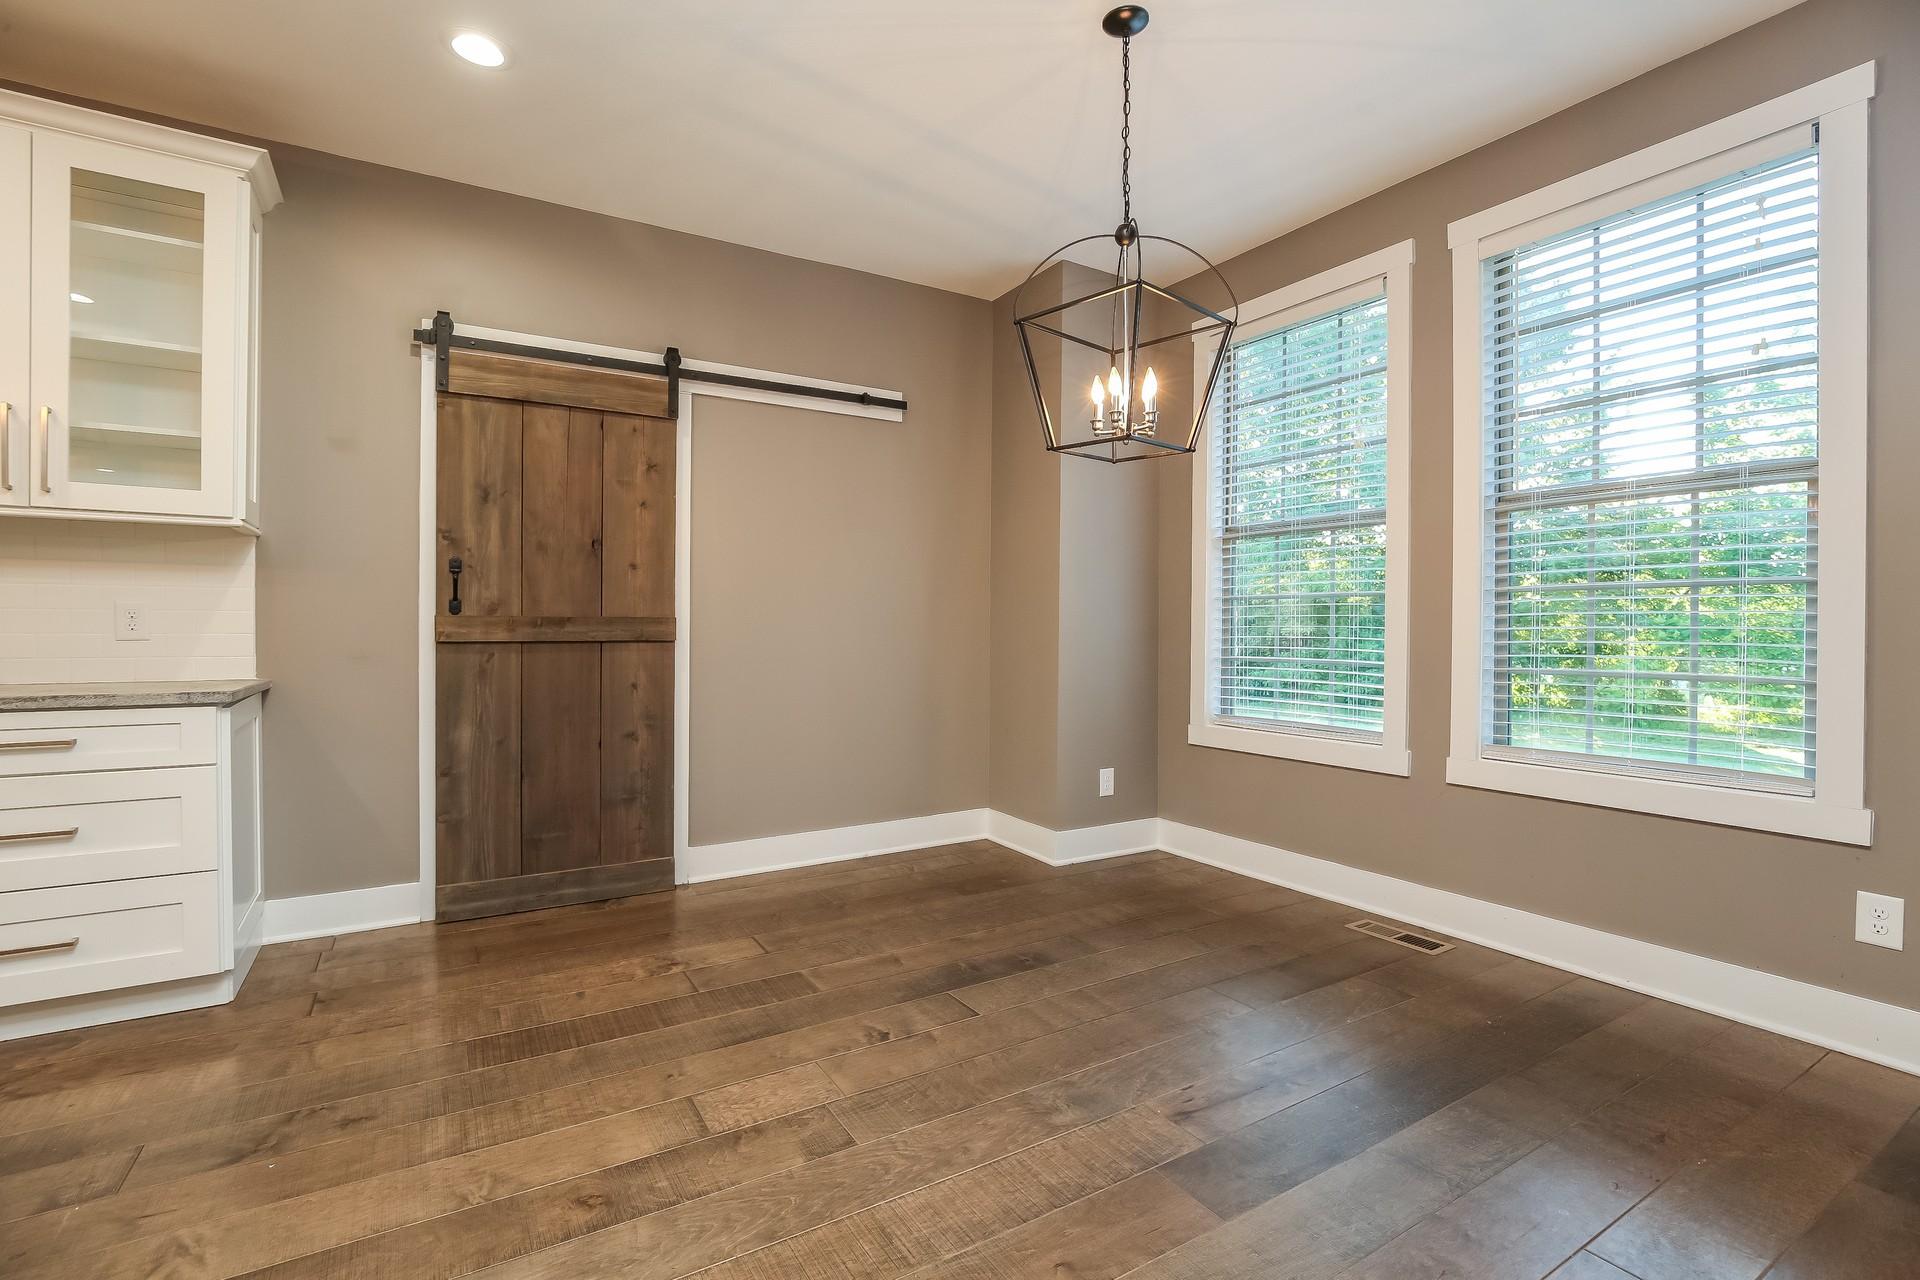 259 Harrowgate Dr Property Photo 12